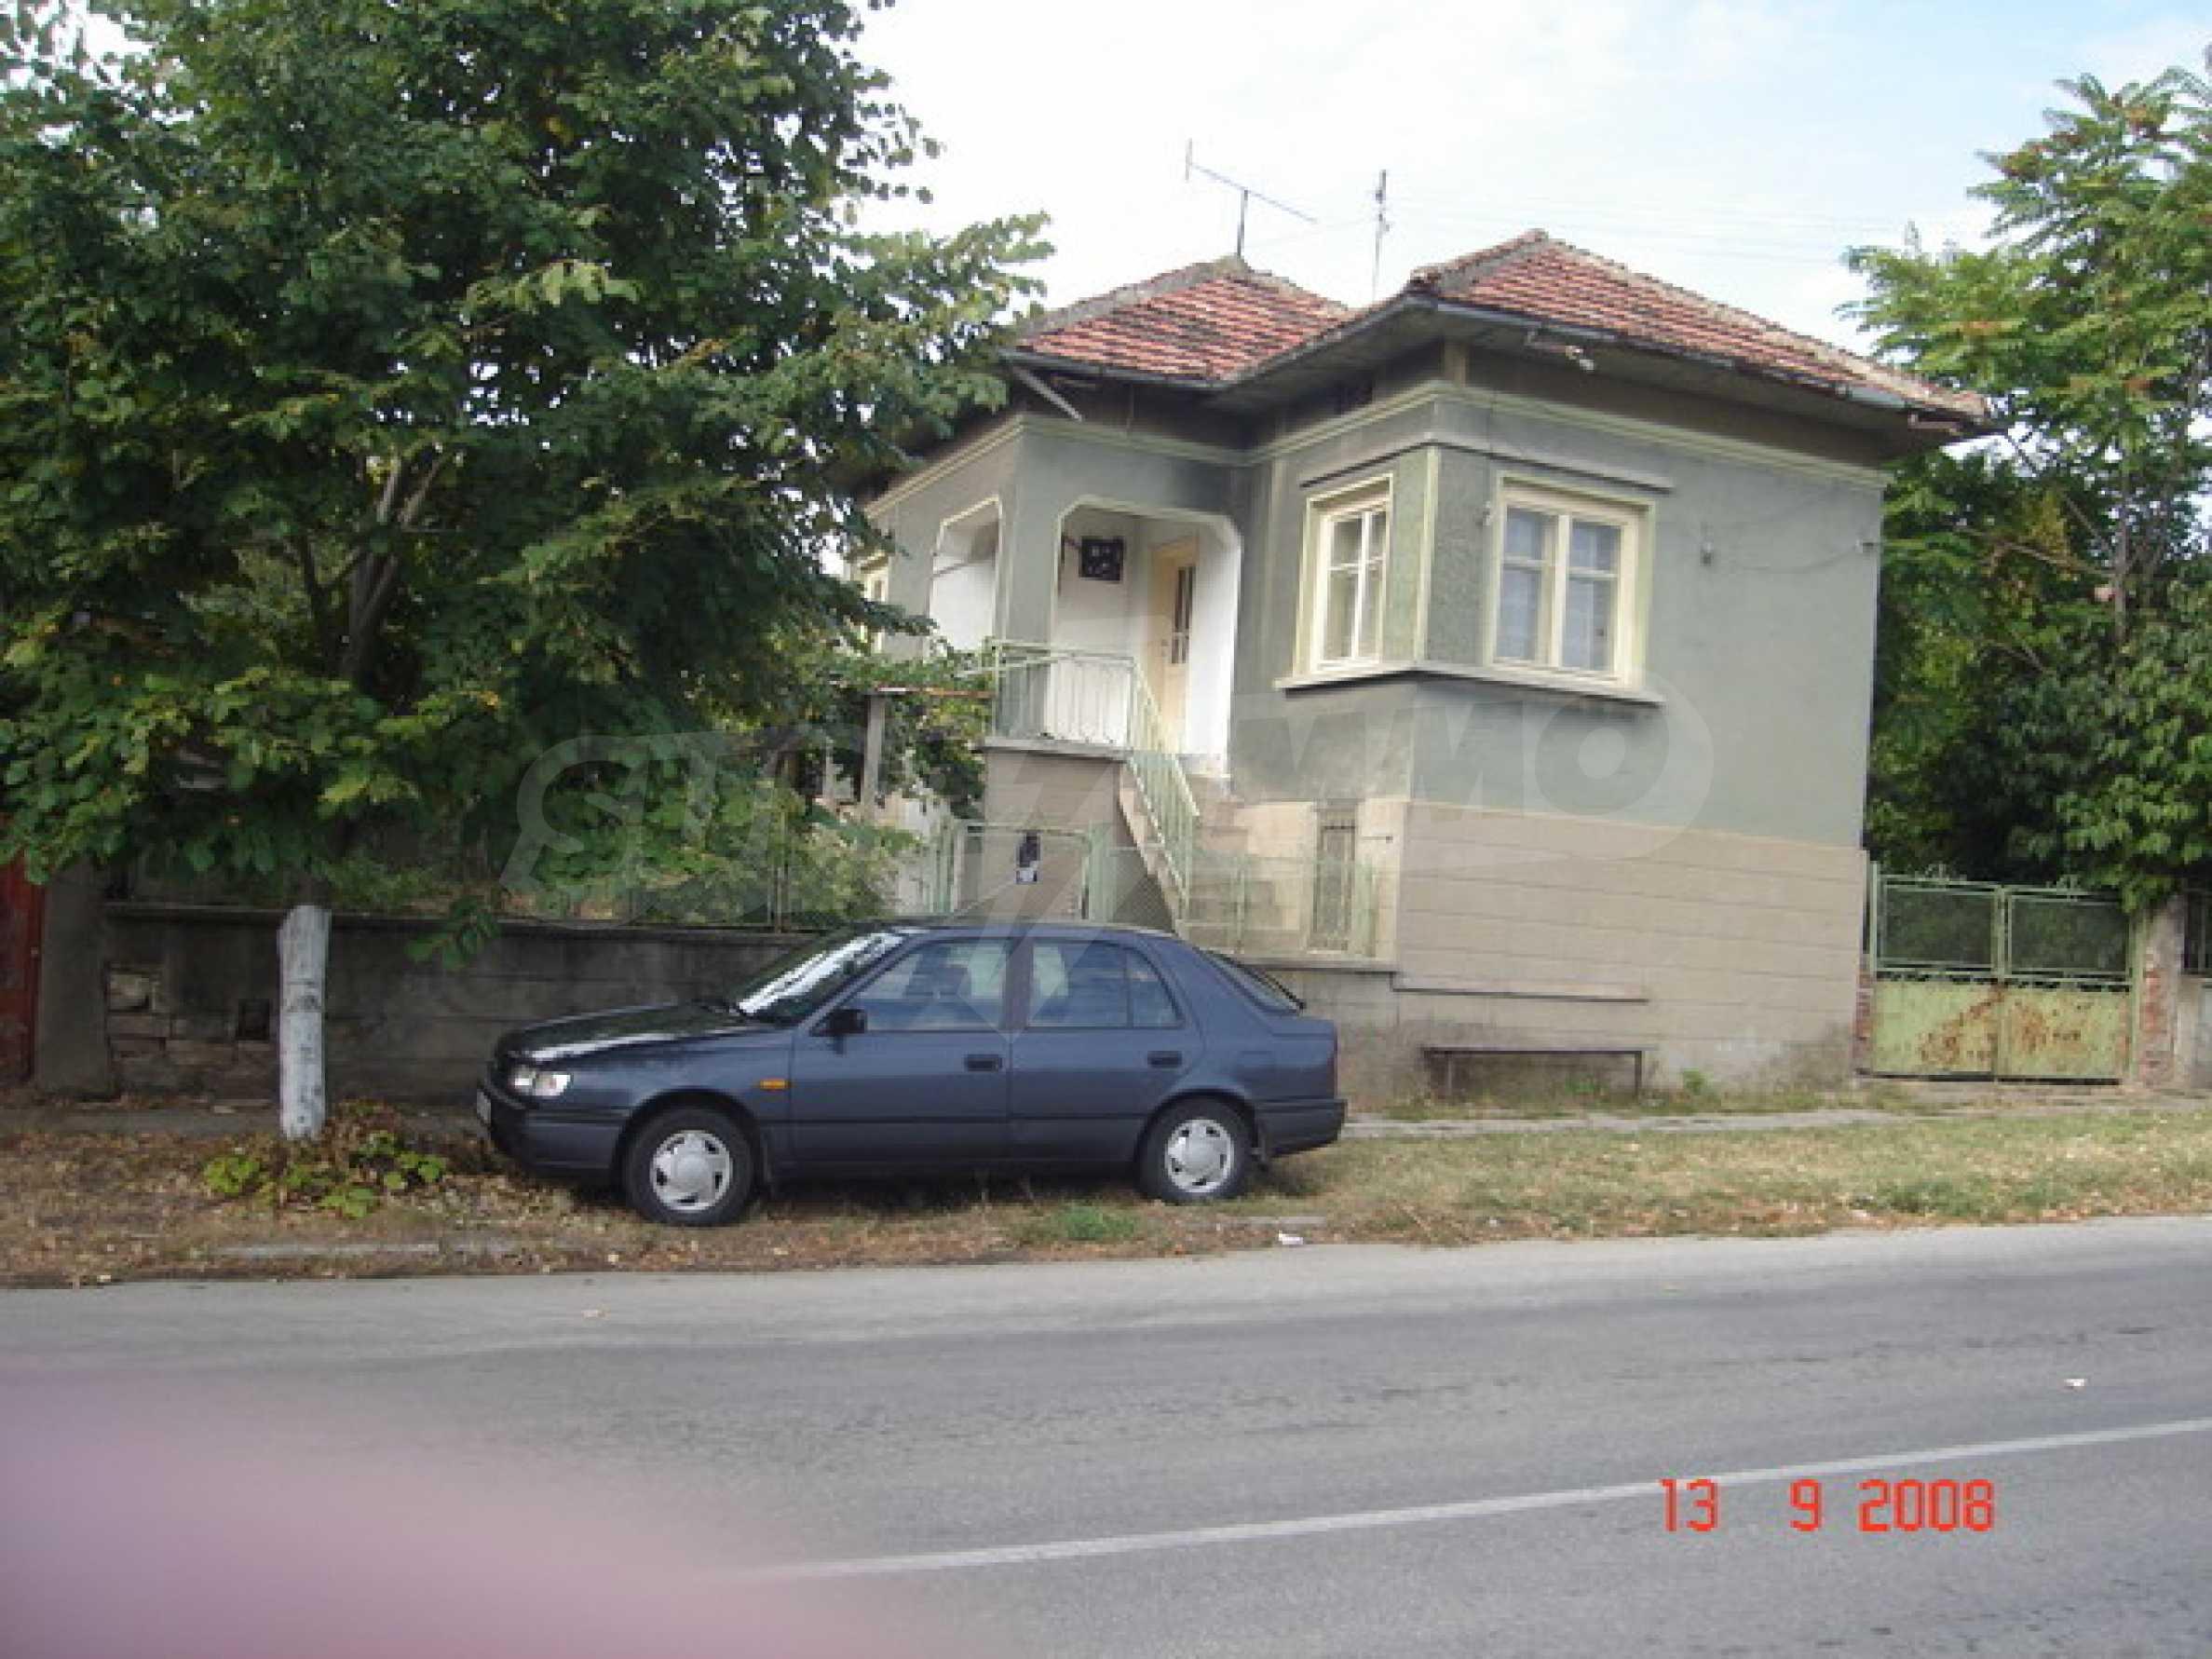 House near the Danube river